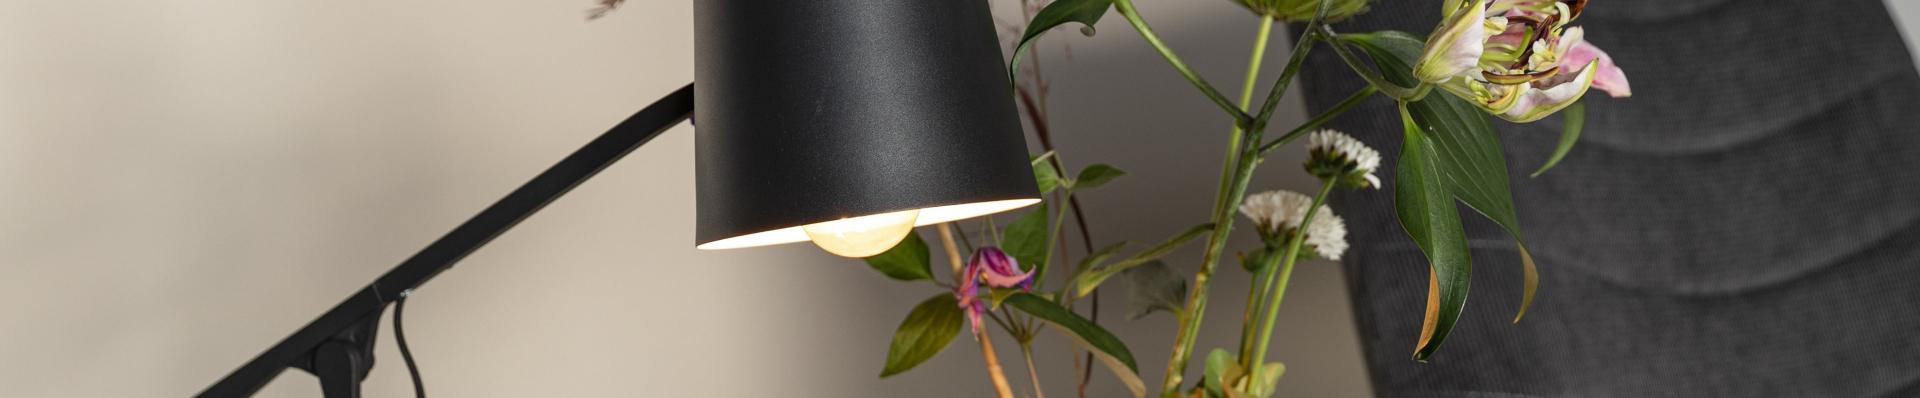 Zuiver bureaulampen